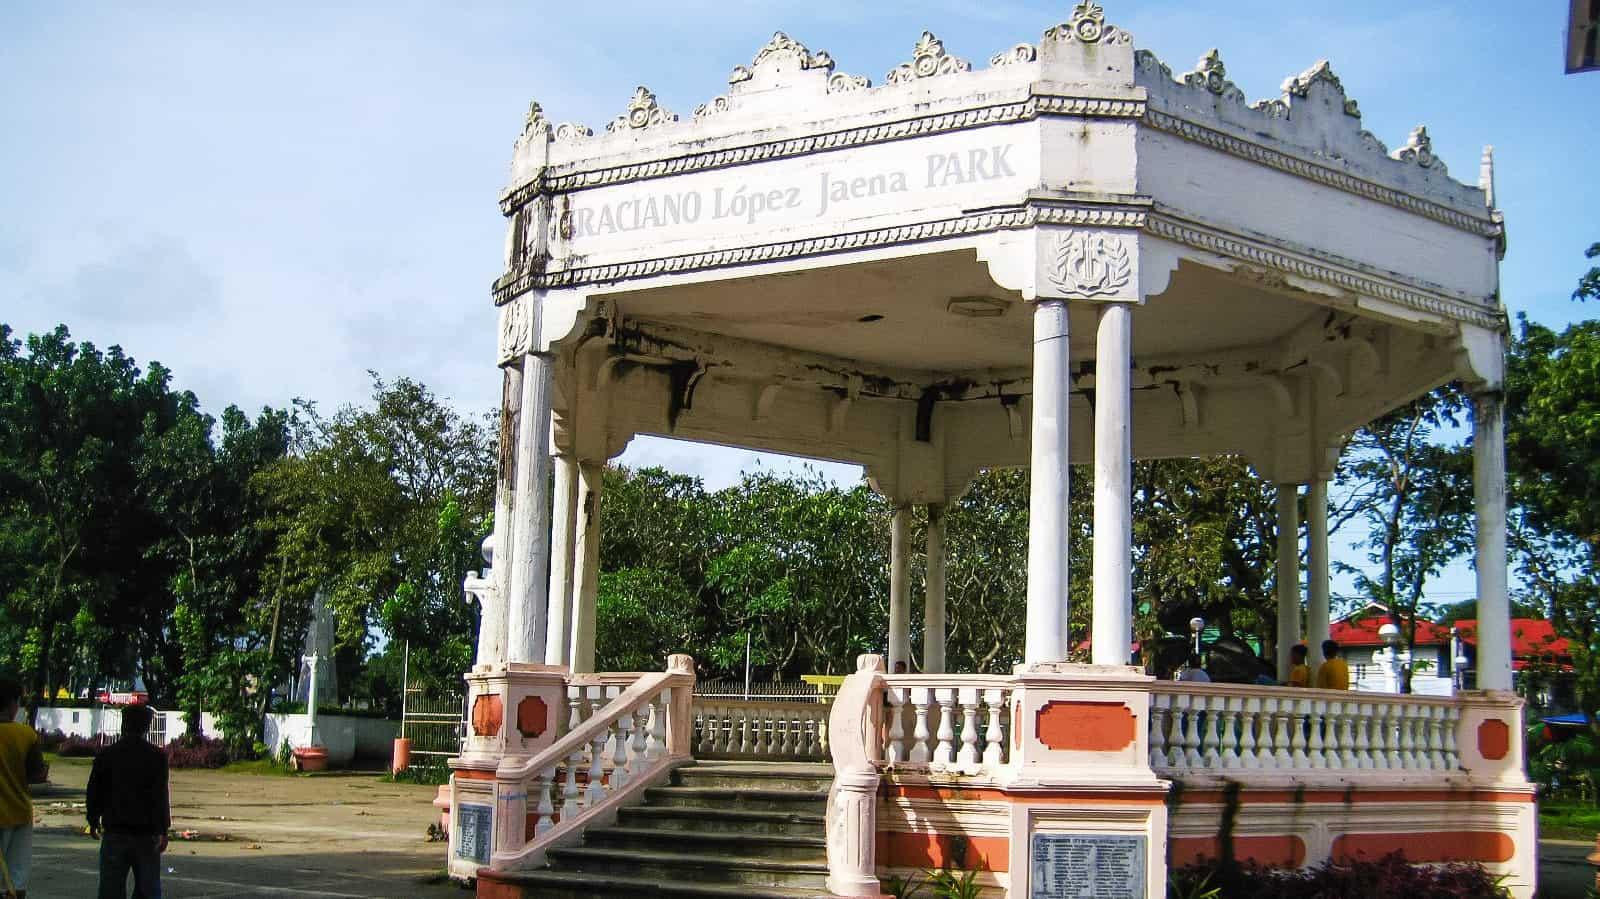 Graciano Lopez Jaena Park: Jaro, Iloilo City, Philippines